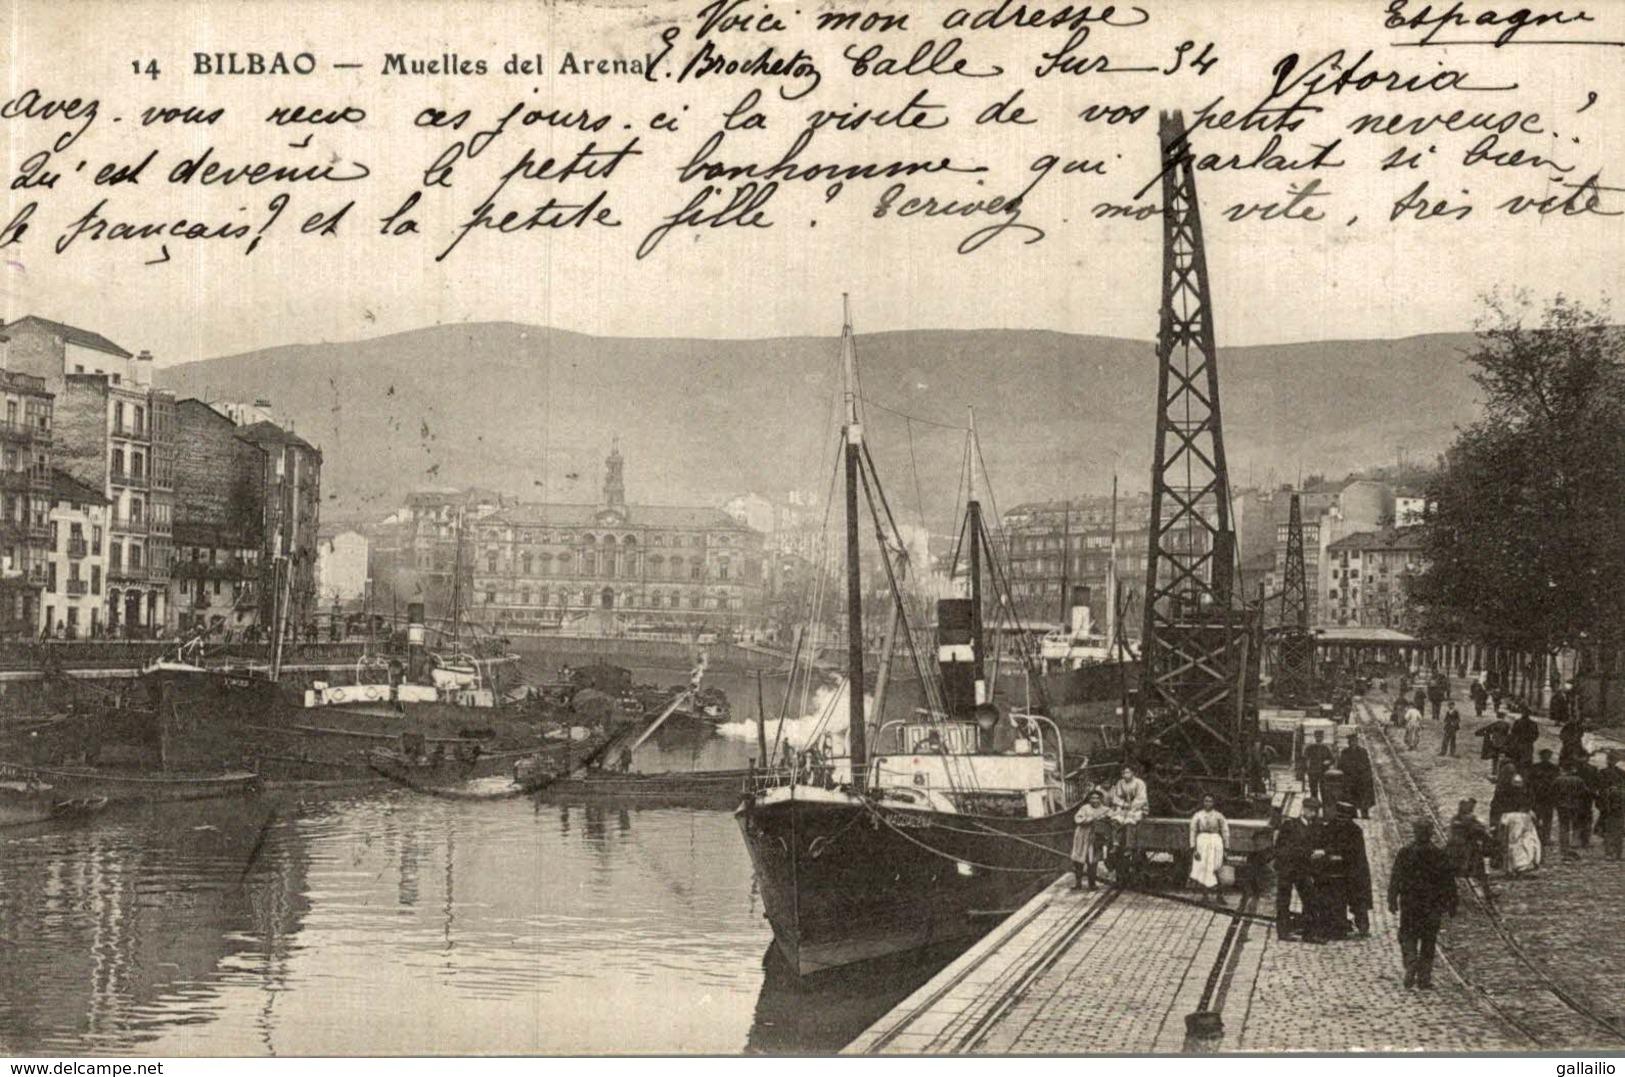 ESPAGNE BILBAO MUELLES DEL ARENAL - Vizcaya (Bilbao)